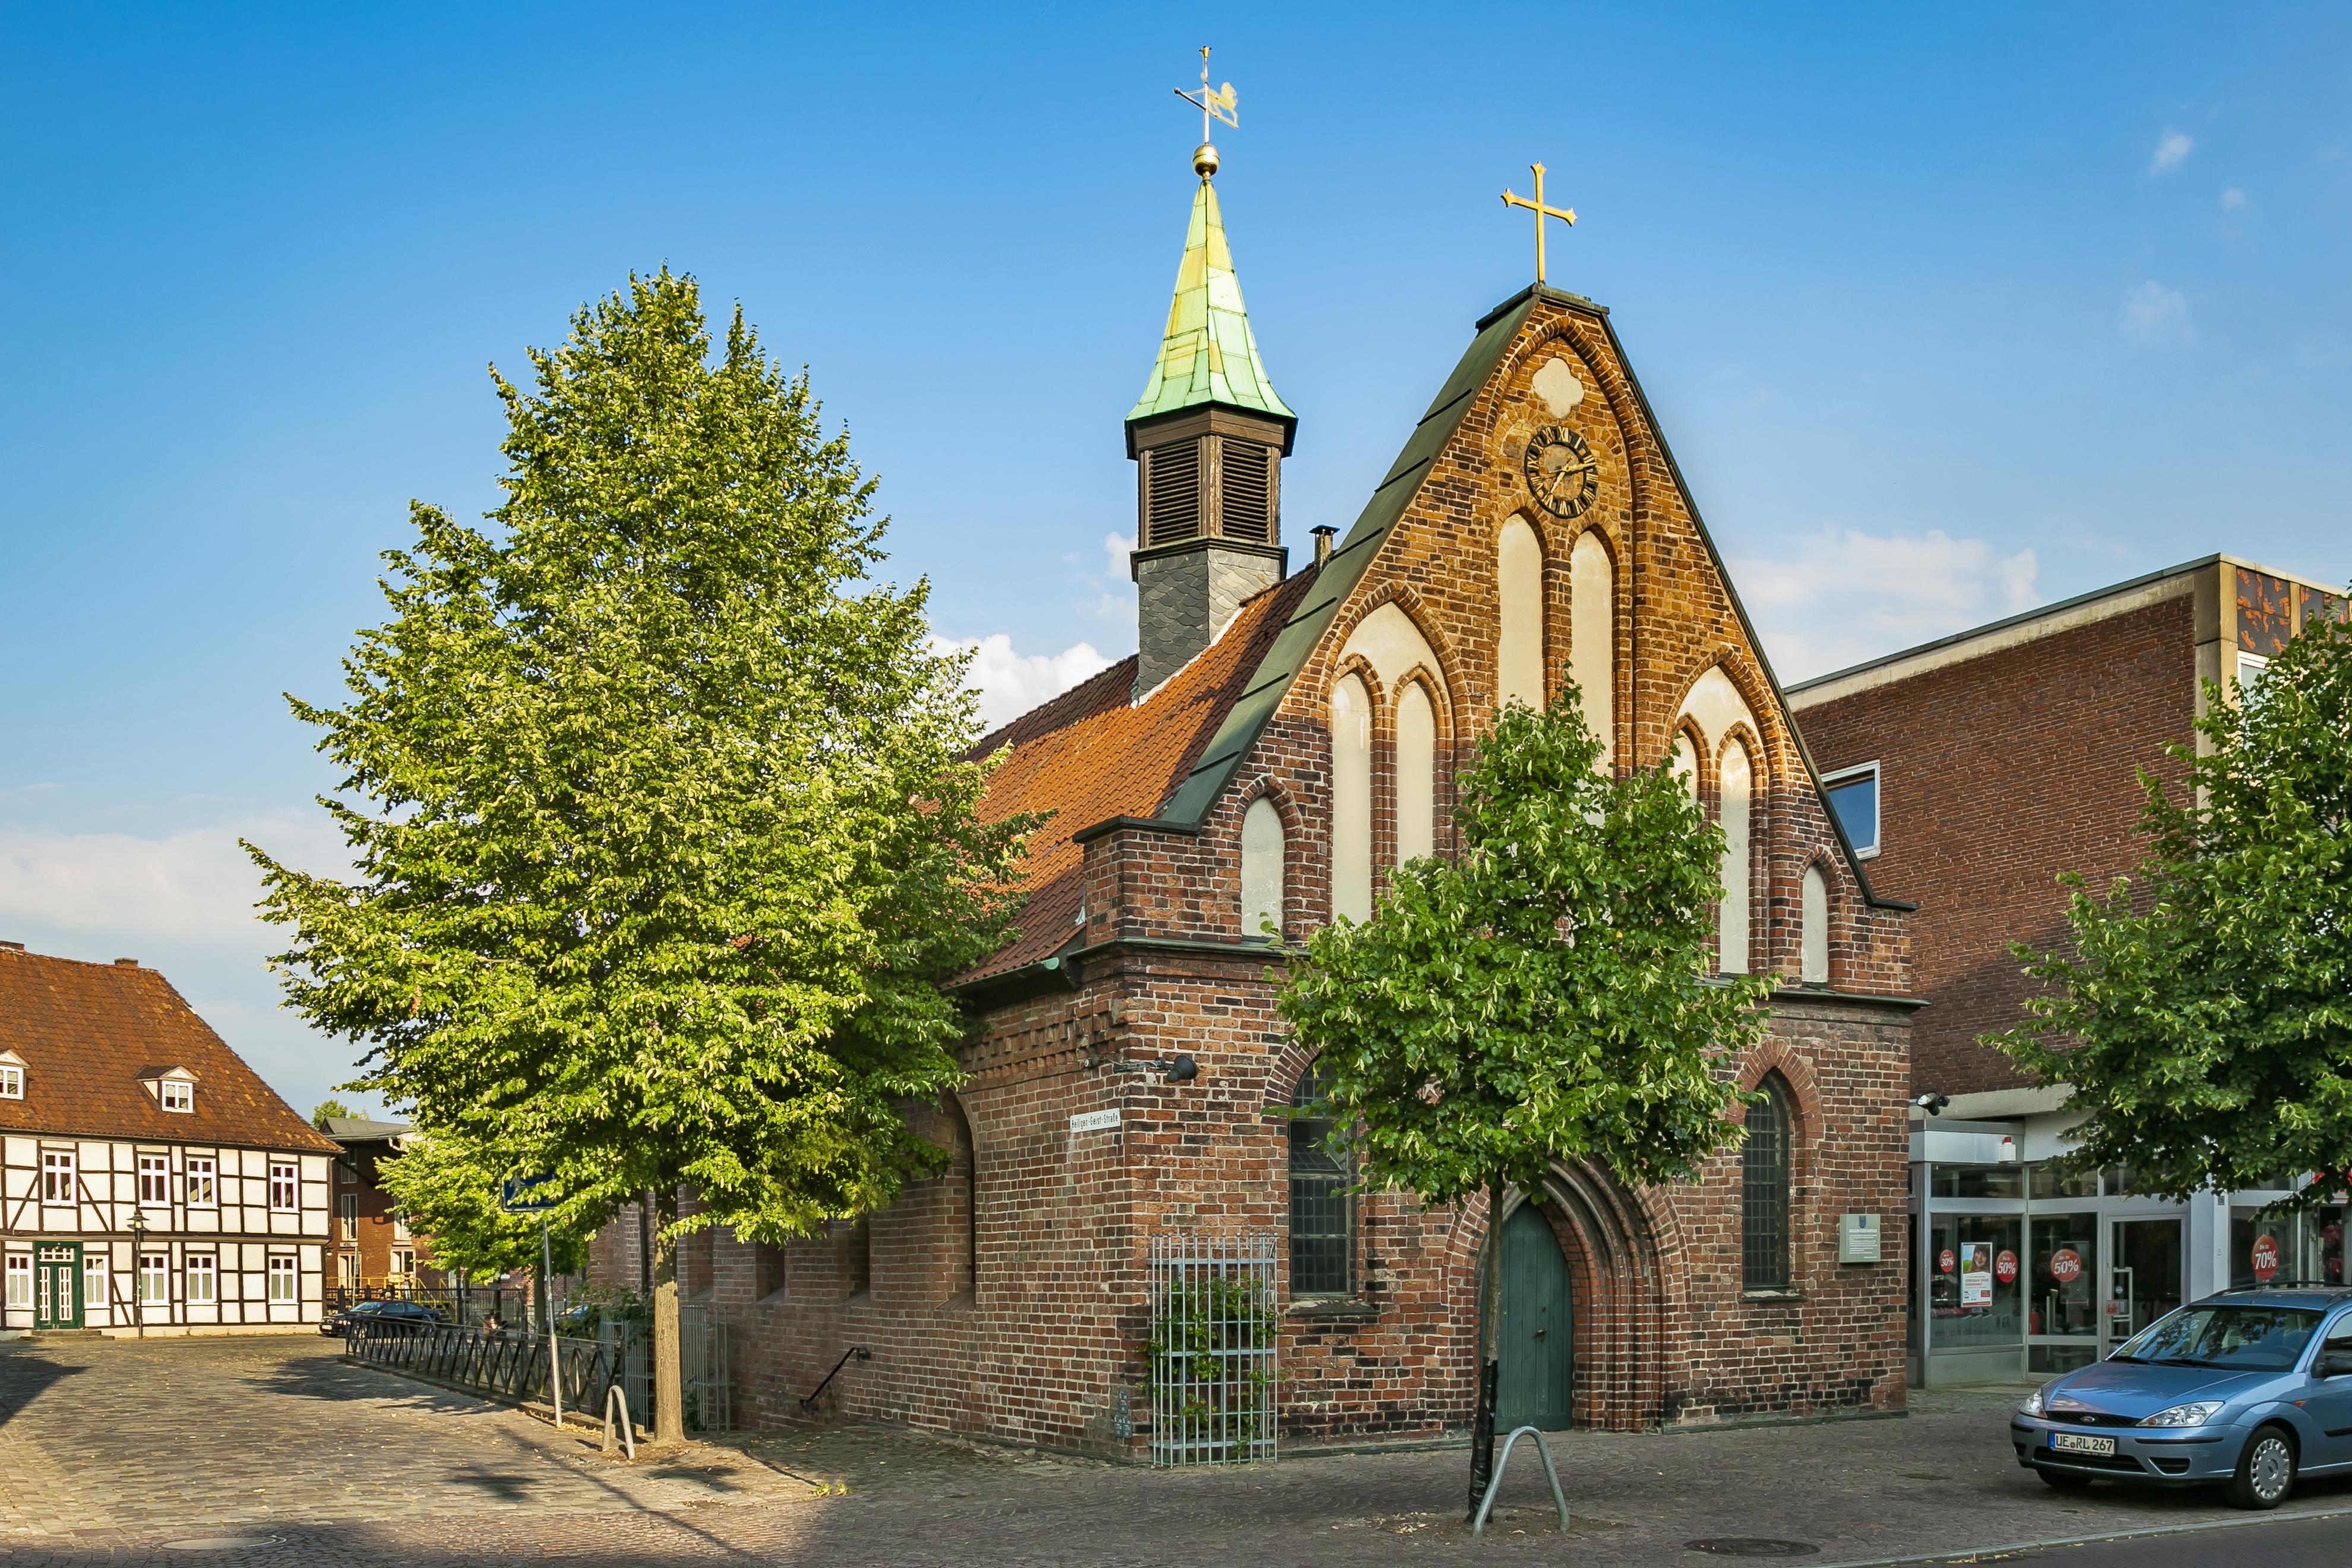 Heiligen-Geist-Kapelle